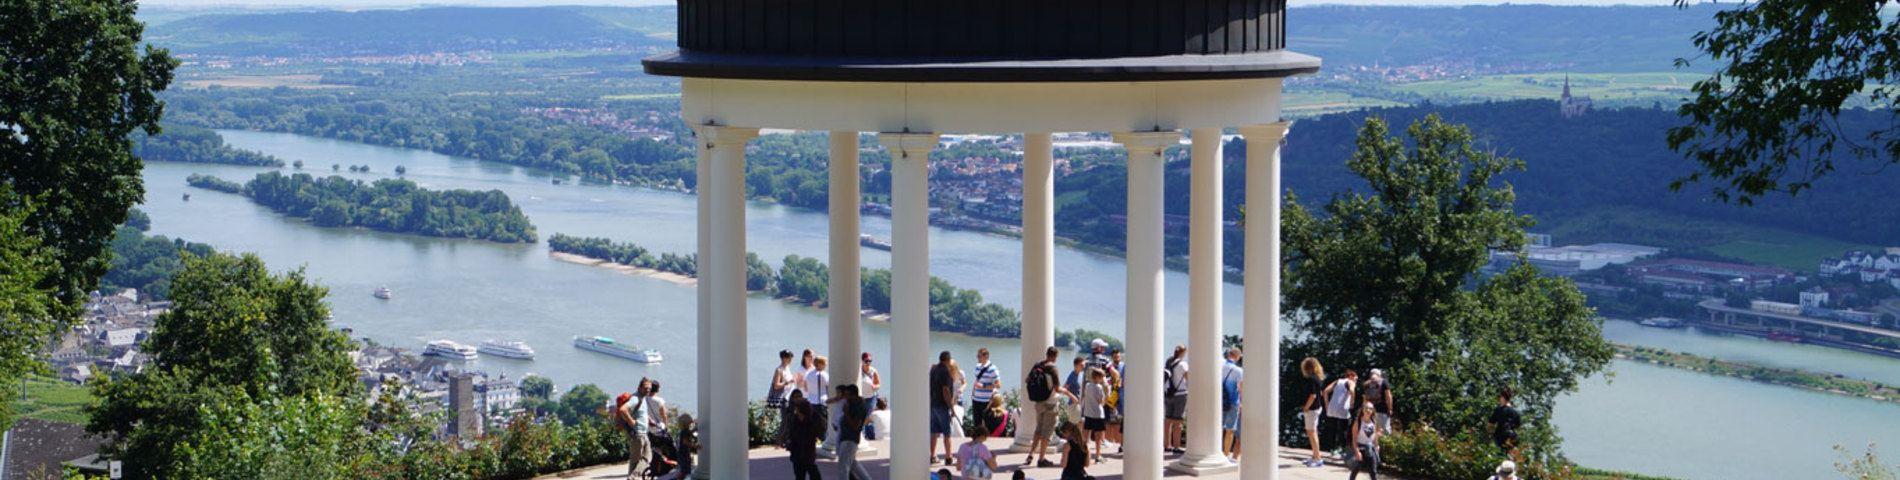 F+U Academy of Languages Heidelberg Language School | 140 Reviews